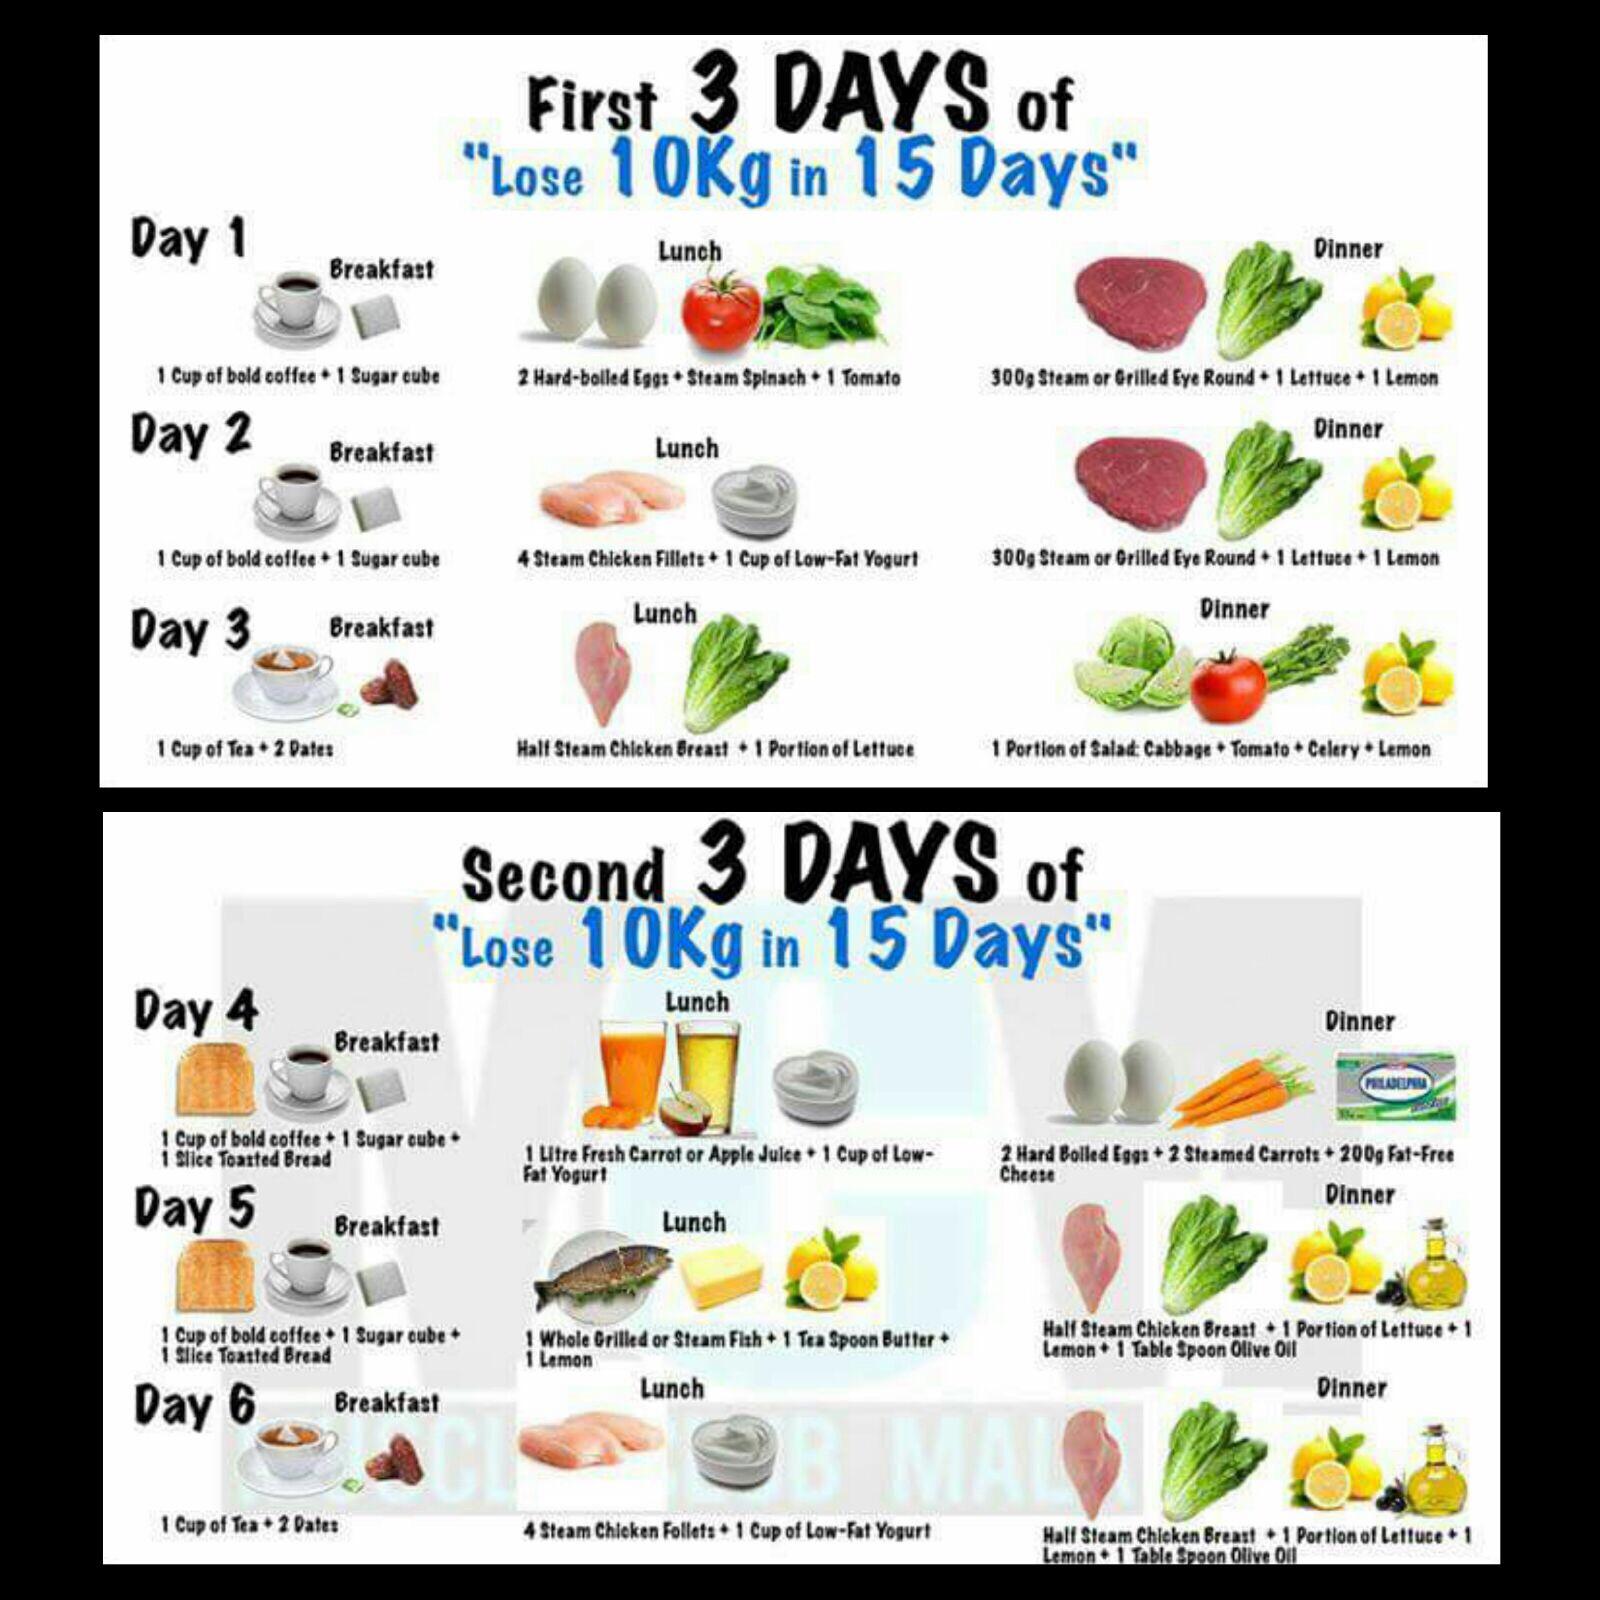 20 Makanan Untuk Diet Yang Paling Membantu Turunkan Berat Badan